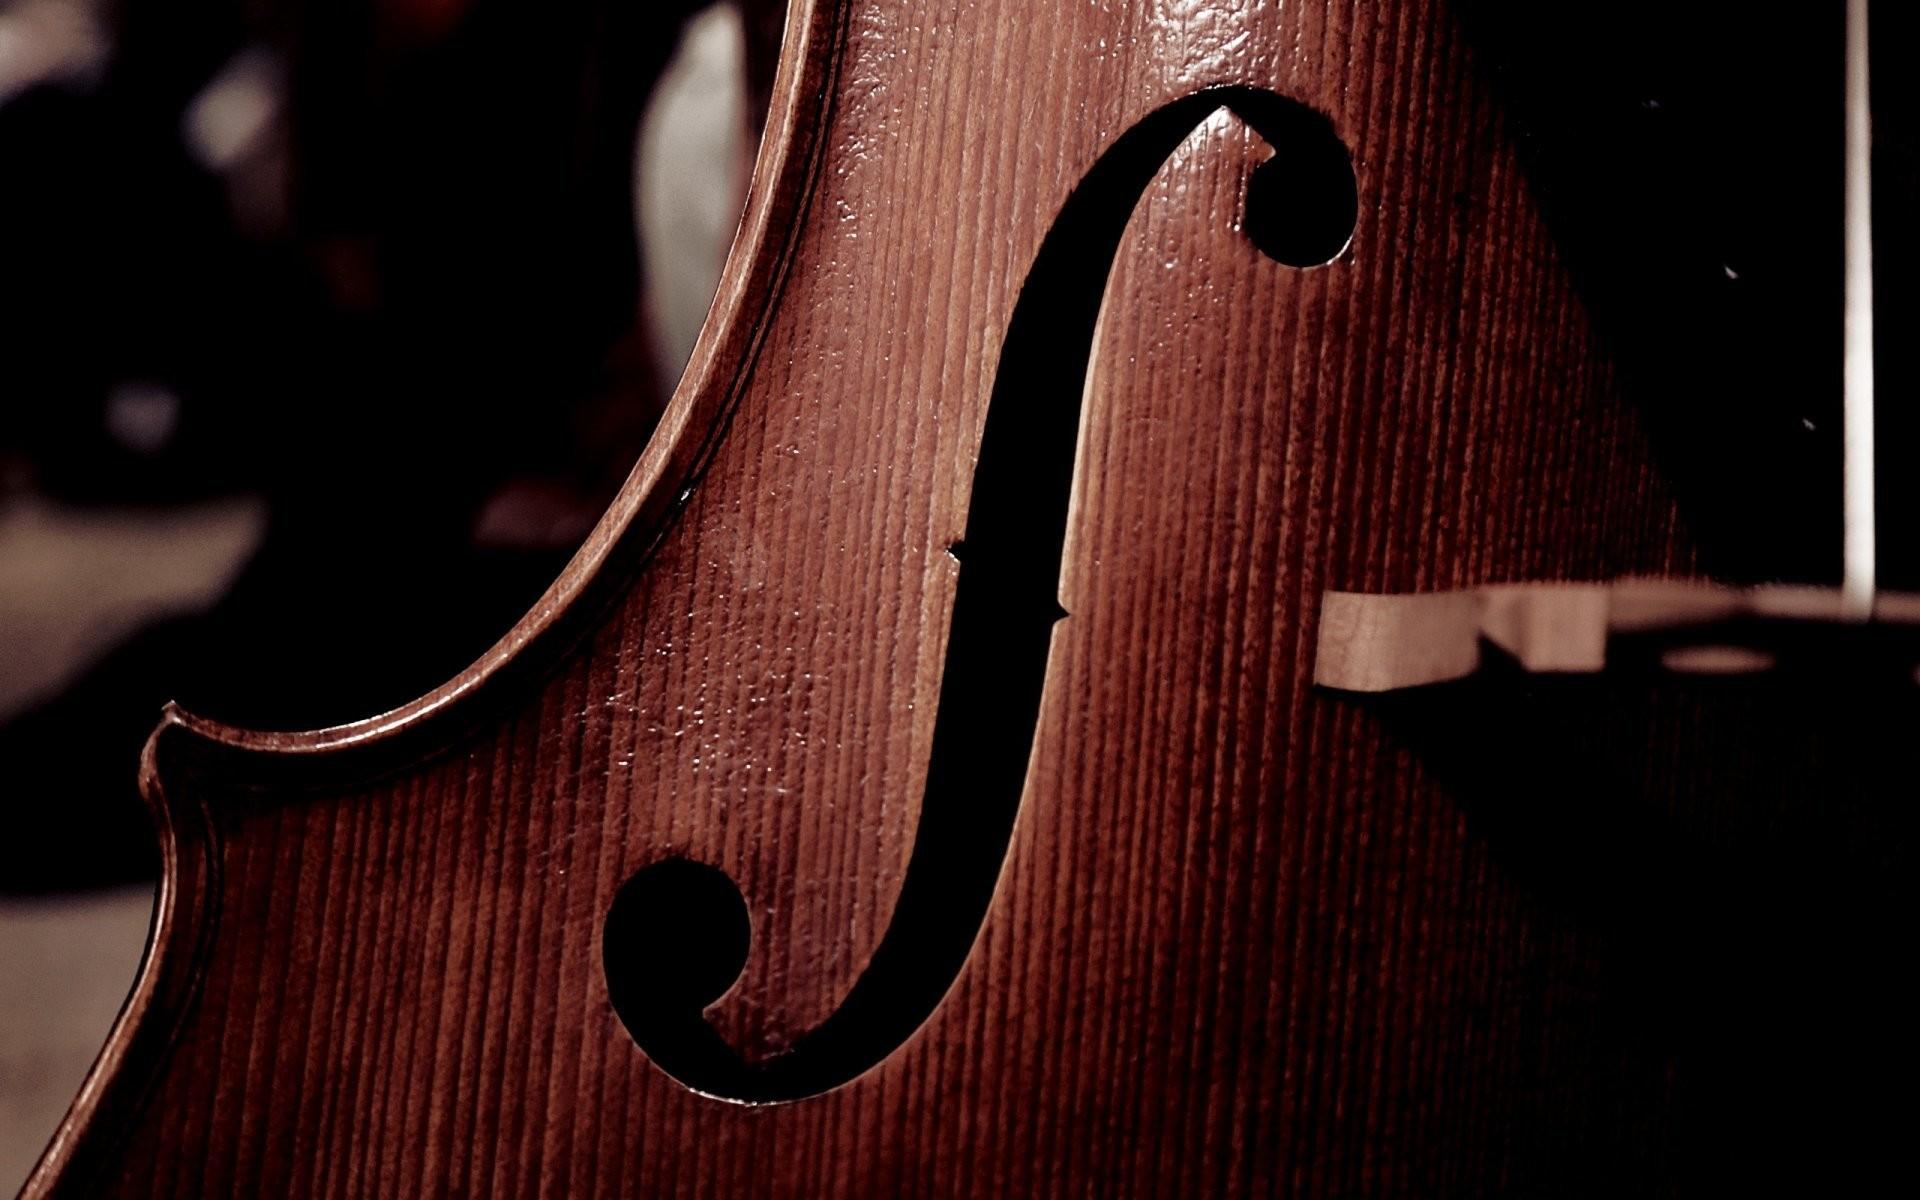 1920x1200 Wallpaperwiki Cello Background Free Download PIC WPC007355